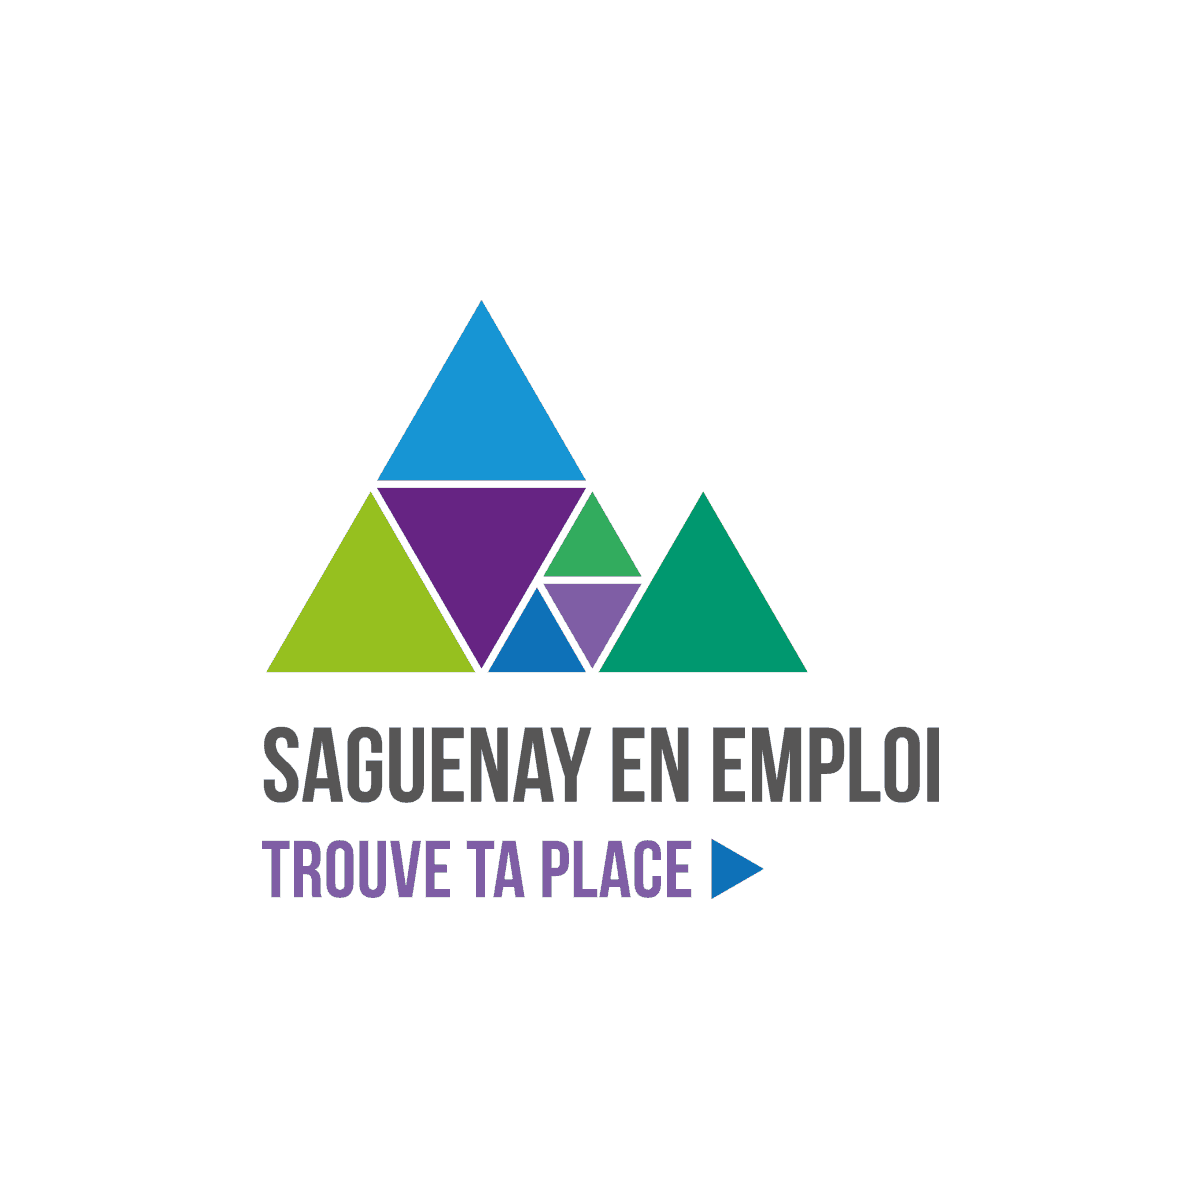 Logo Saguenay en emploi - Par Cyan Concept